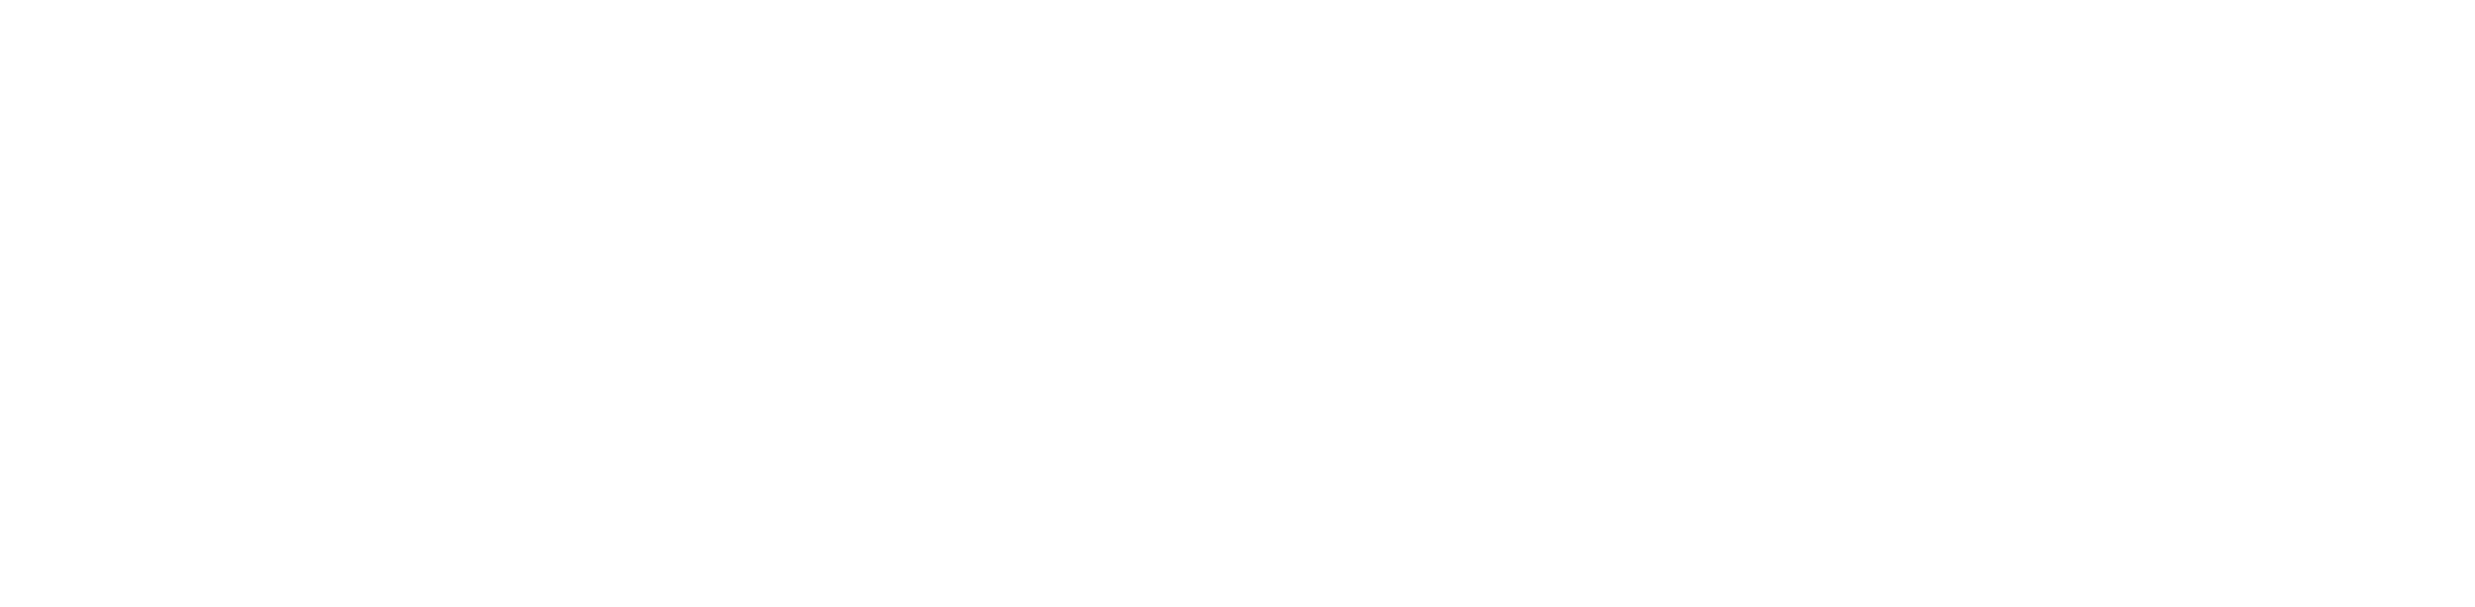 Smart Turf white mtime20191223142144